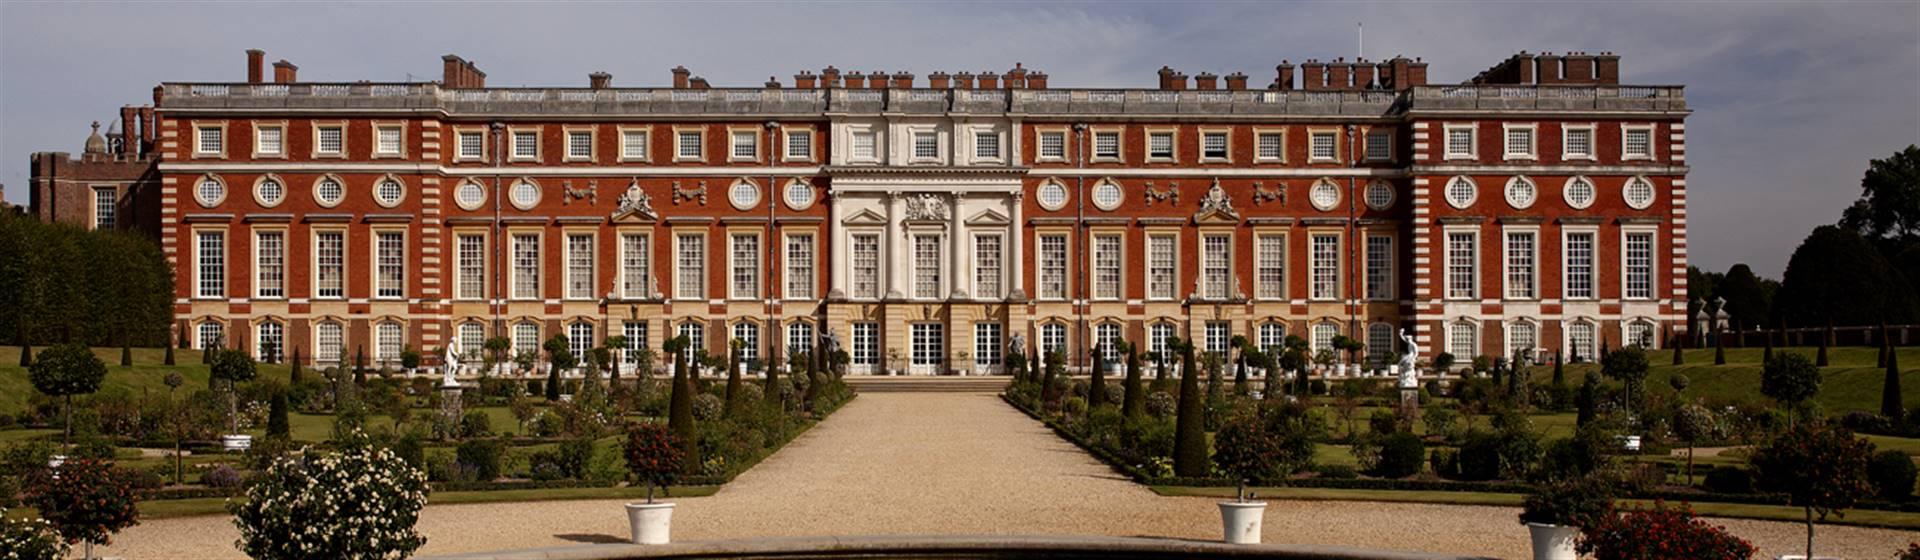 Hampton Court Palace - Historic Royal Palaces